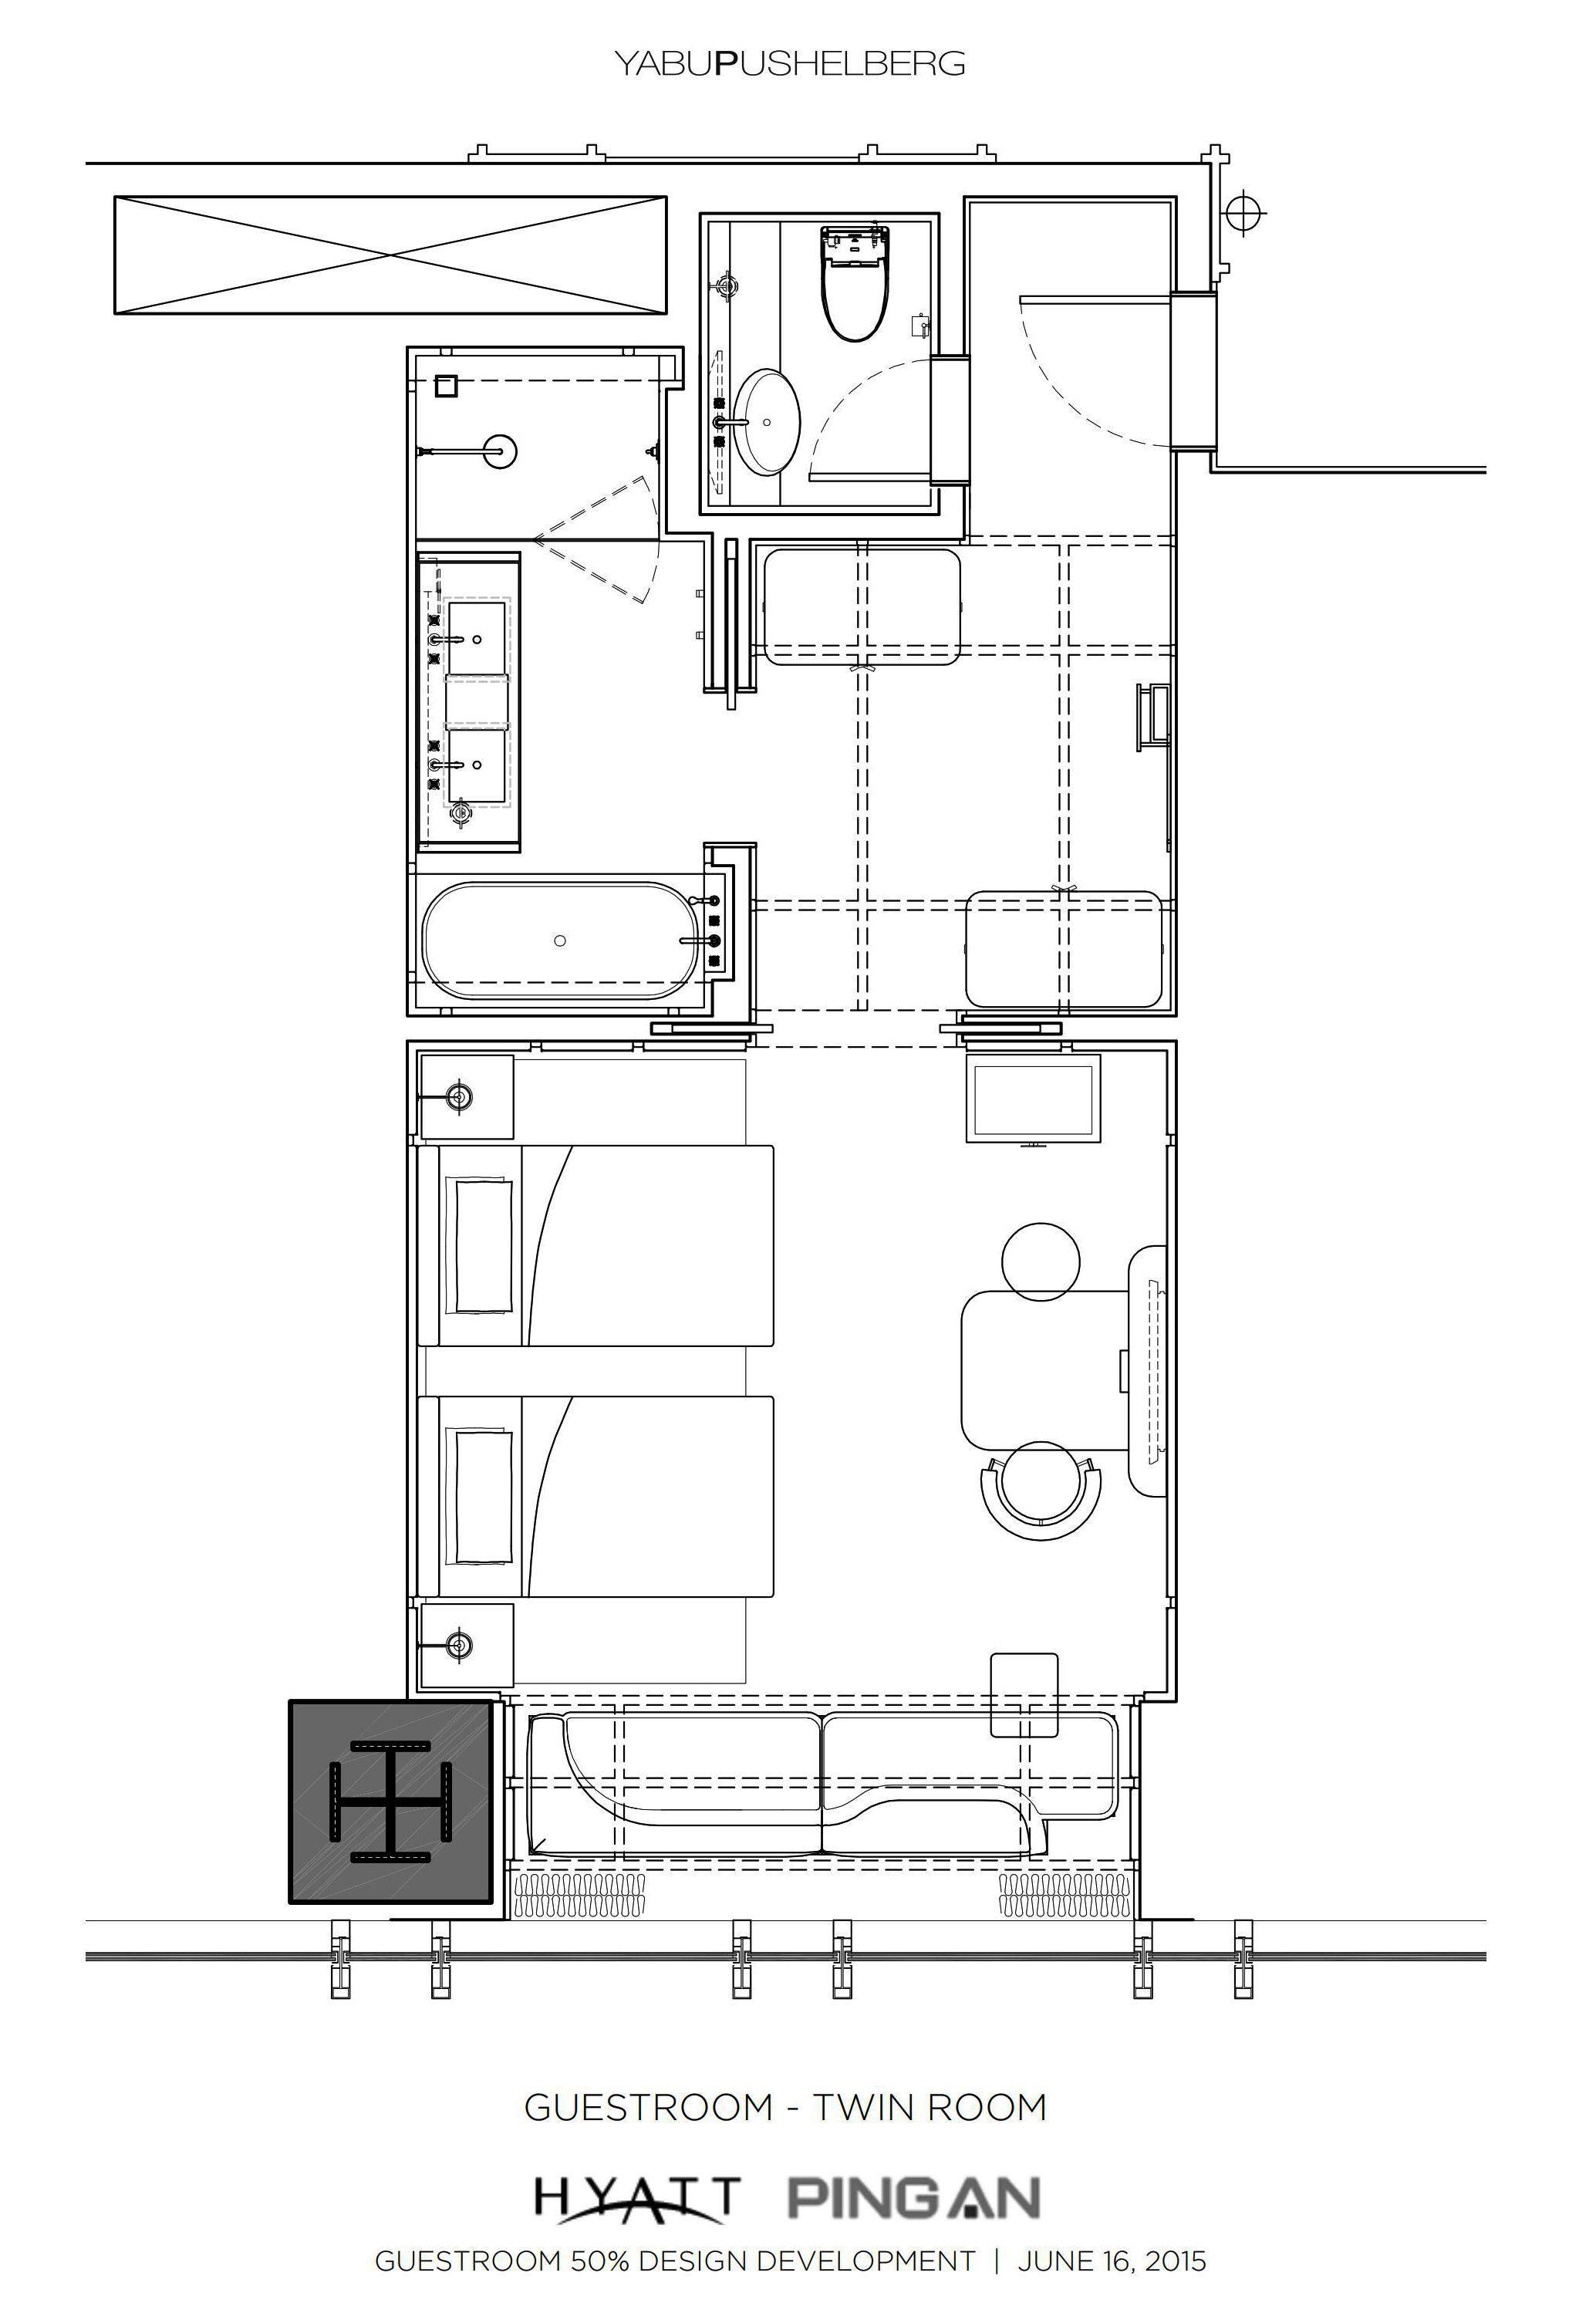 Re Park Hyatt Shenzhen Twin Guest Room Hotel Floor Plan Hotel Plan Hotel Floor